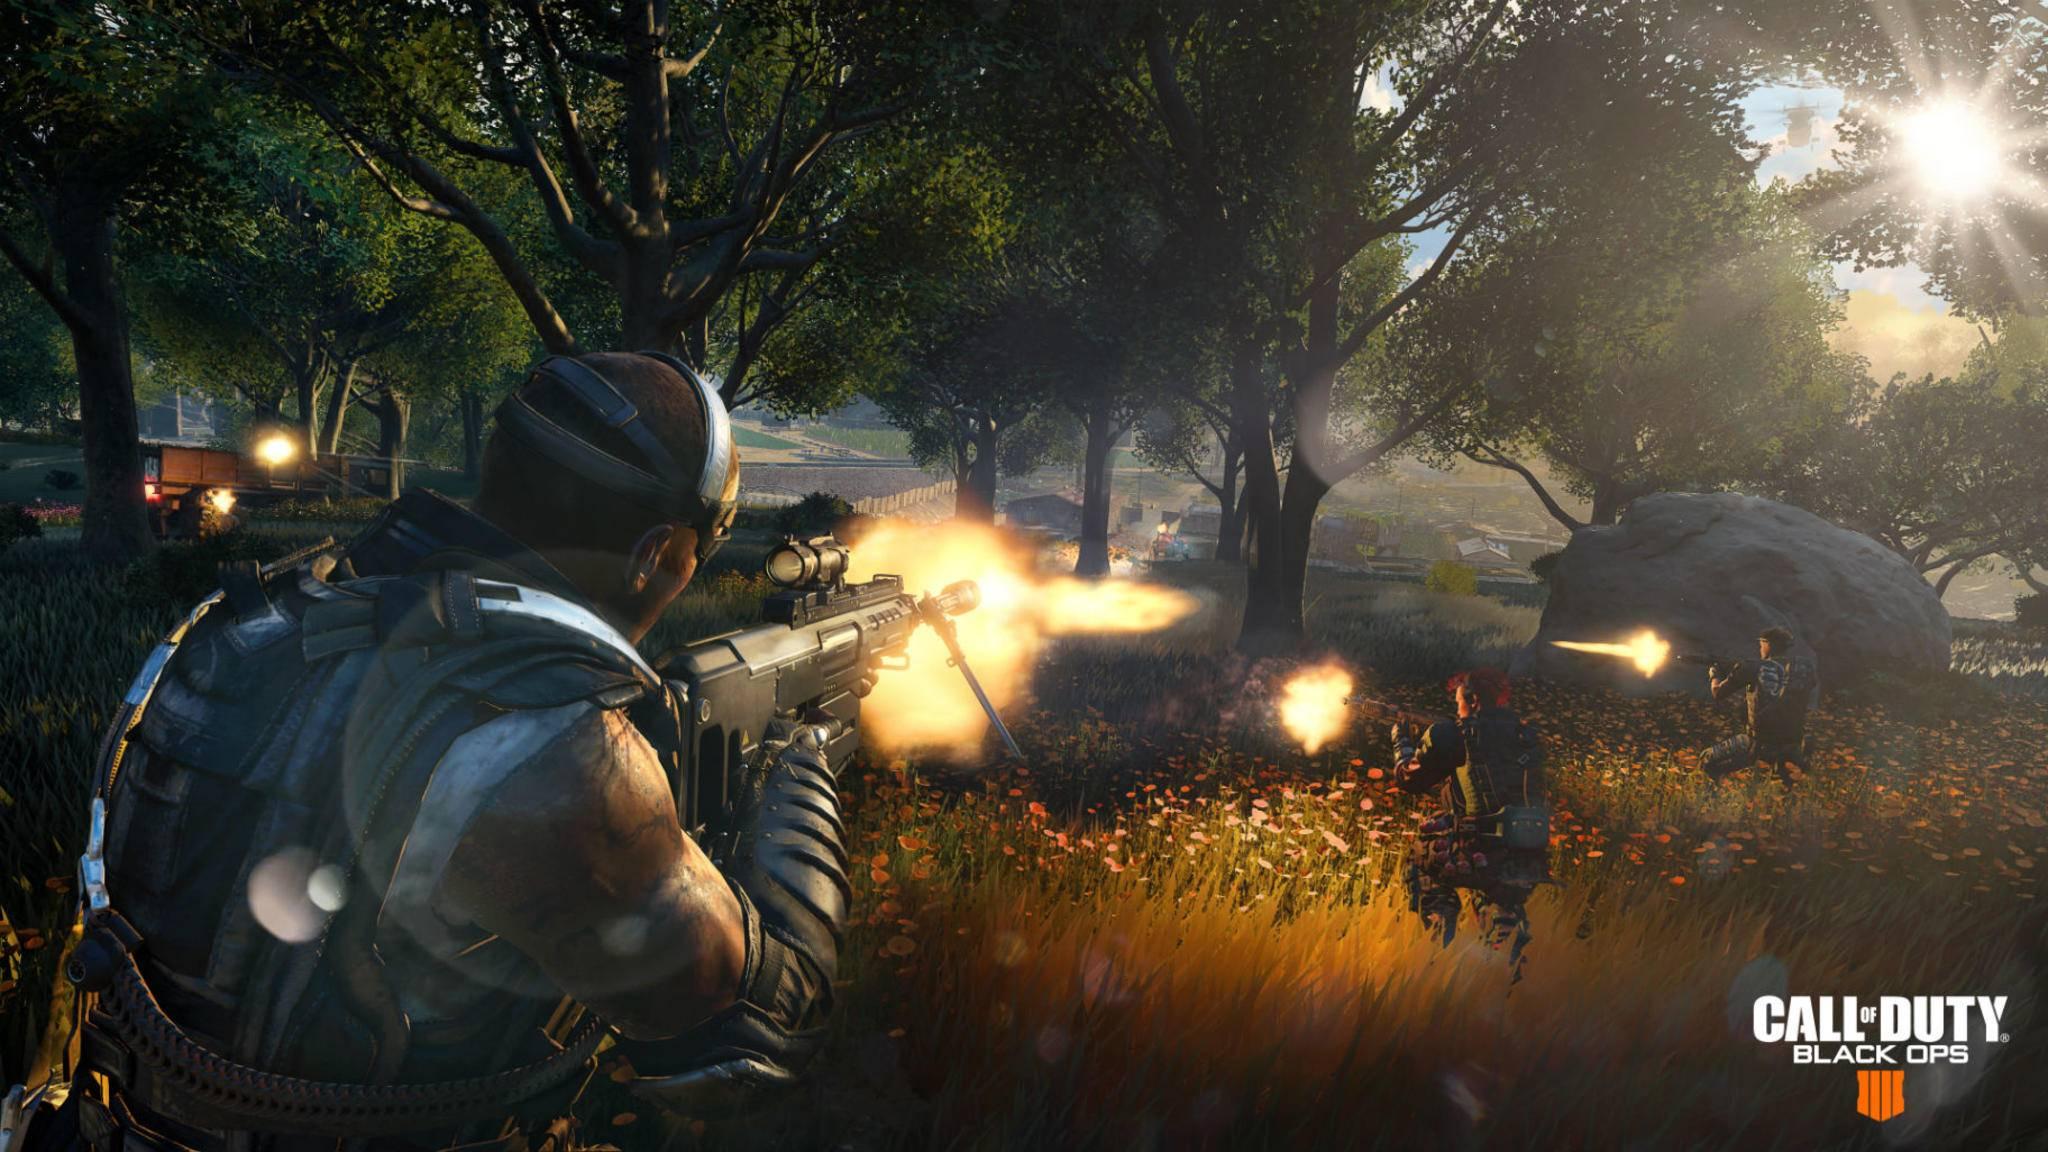 """Call of Duty: Black Ops 4"": Welche Waffen sind am besten?"